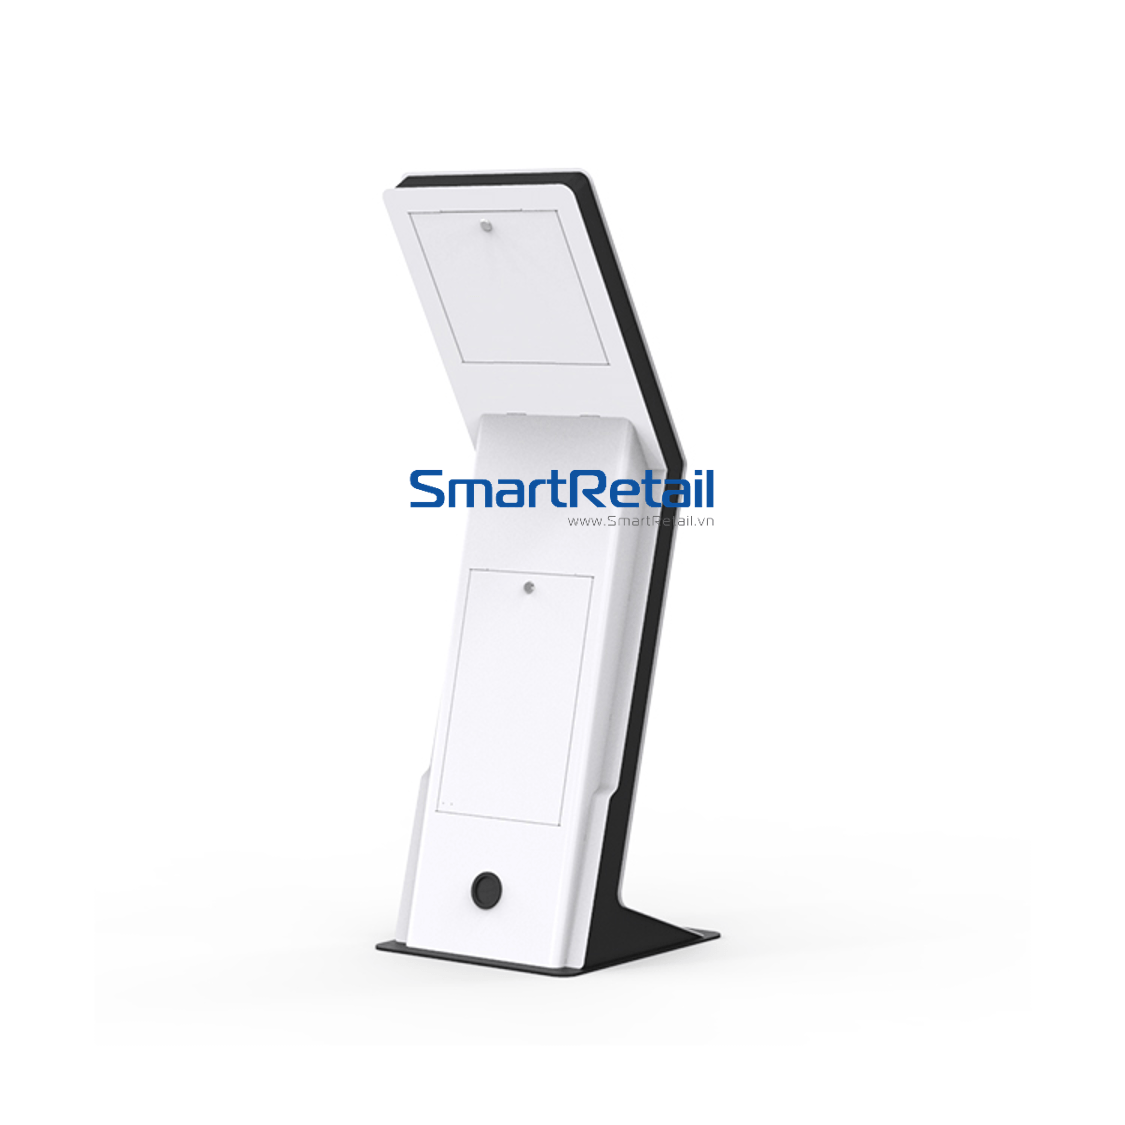 SmartRetail Thiet bi bao ve Tablet SF105 2